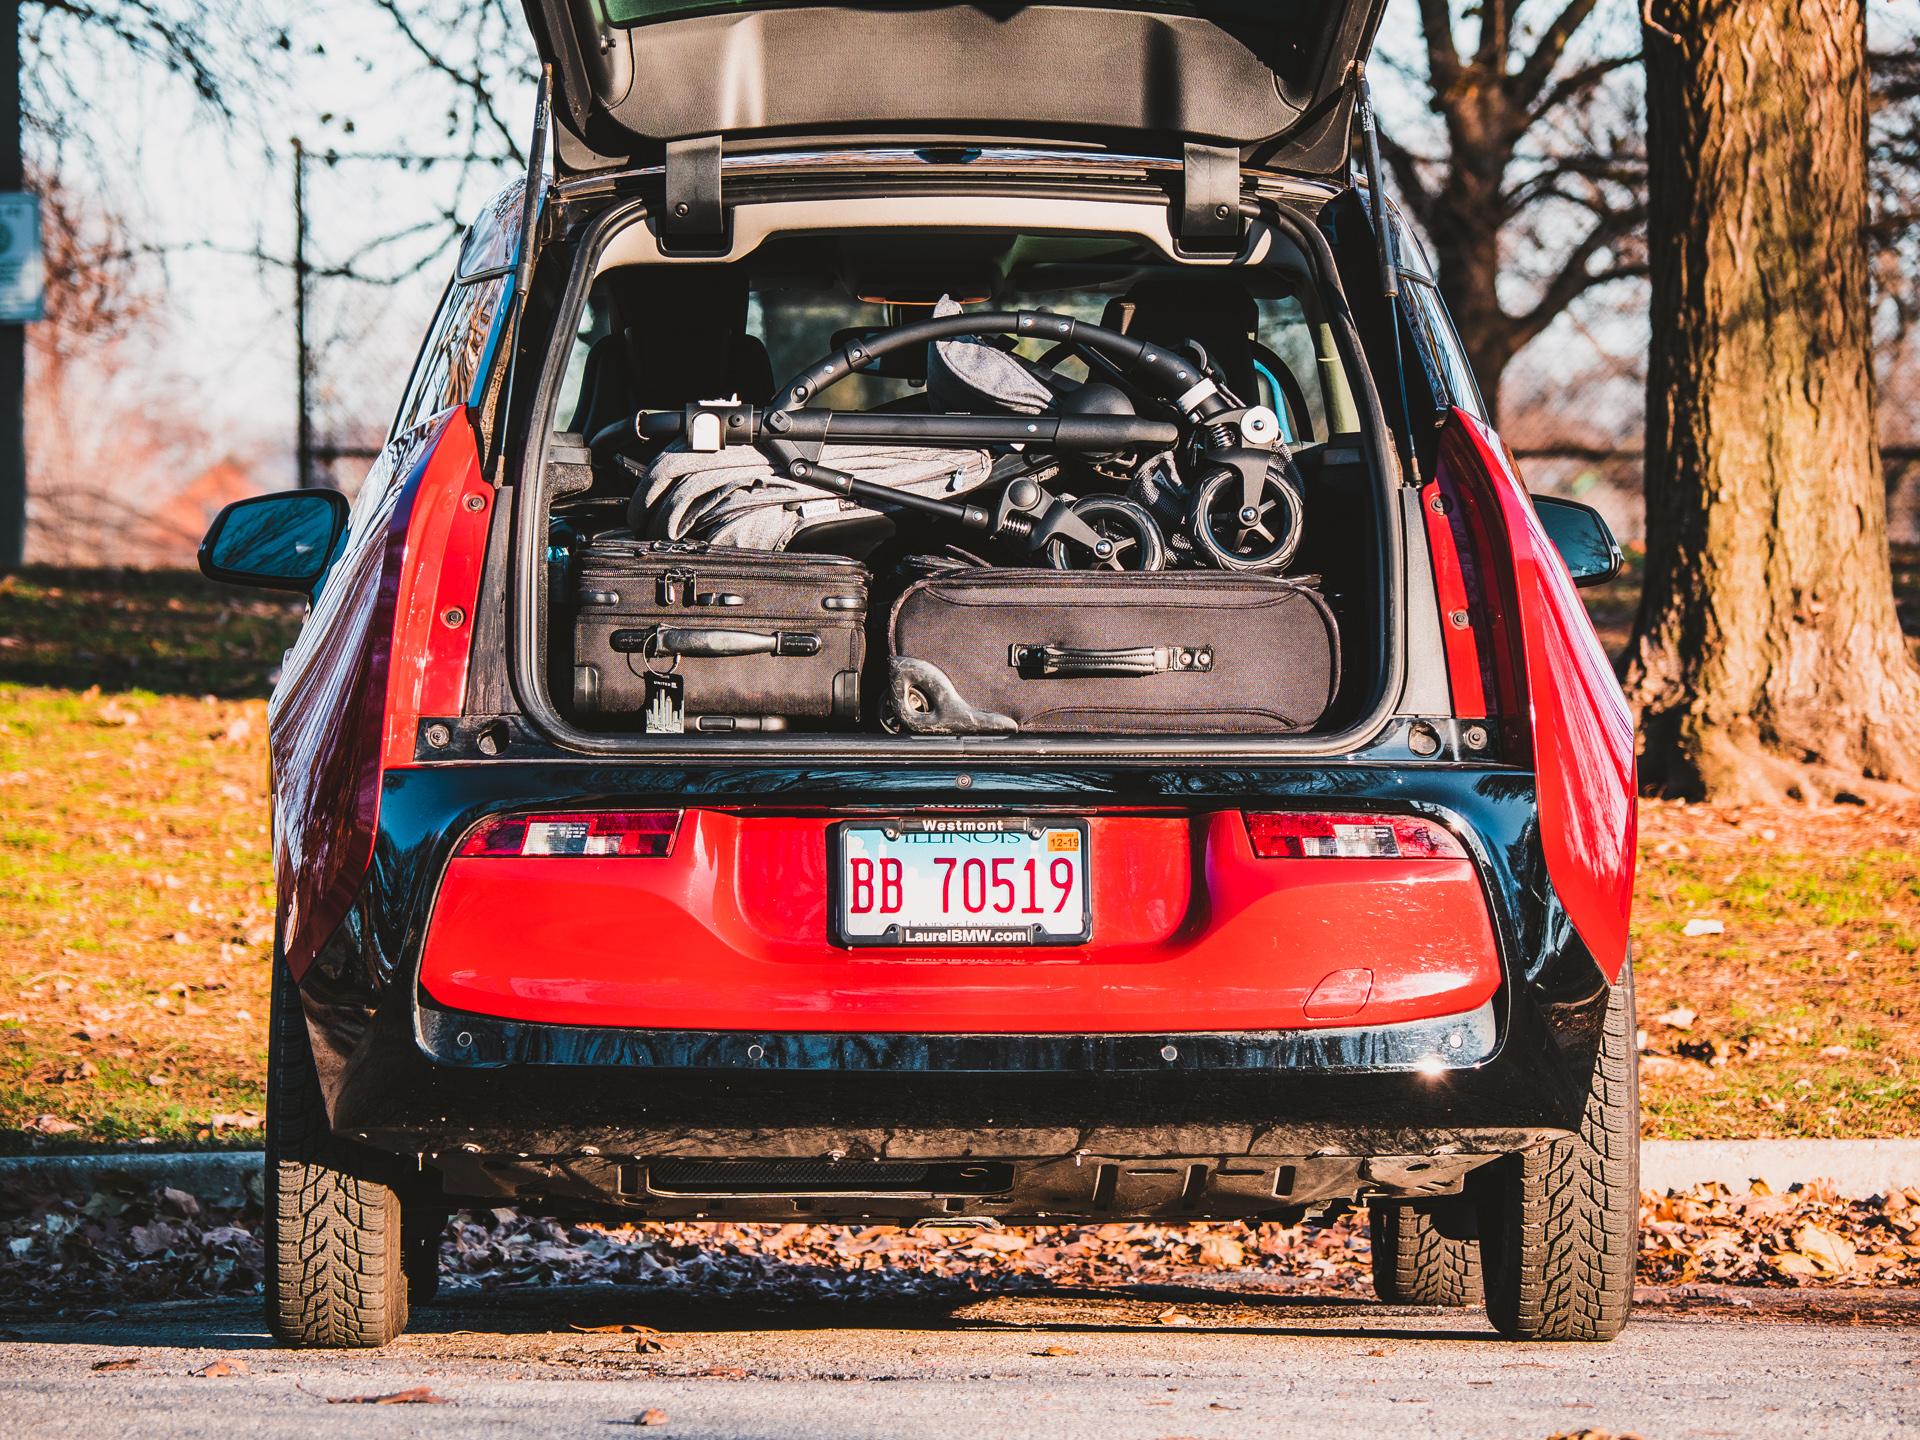 BMW i3 Cargo Space stroller 2